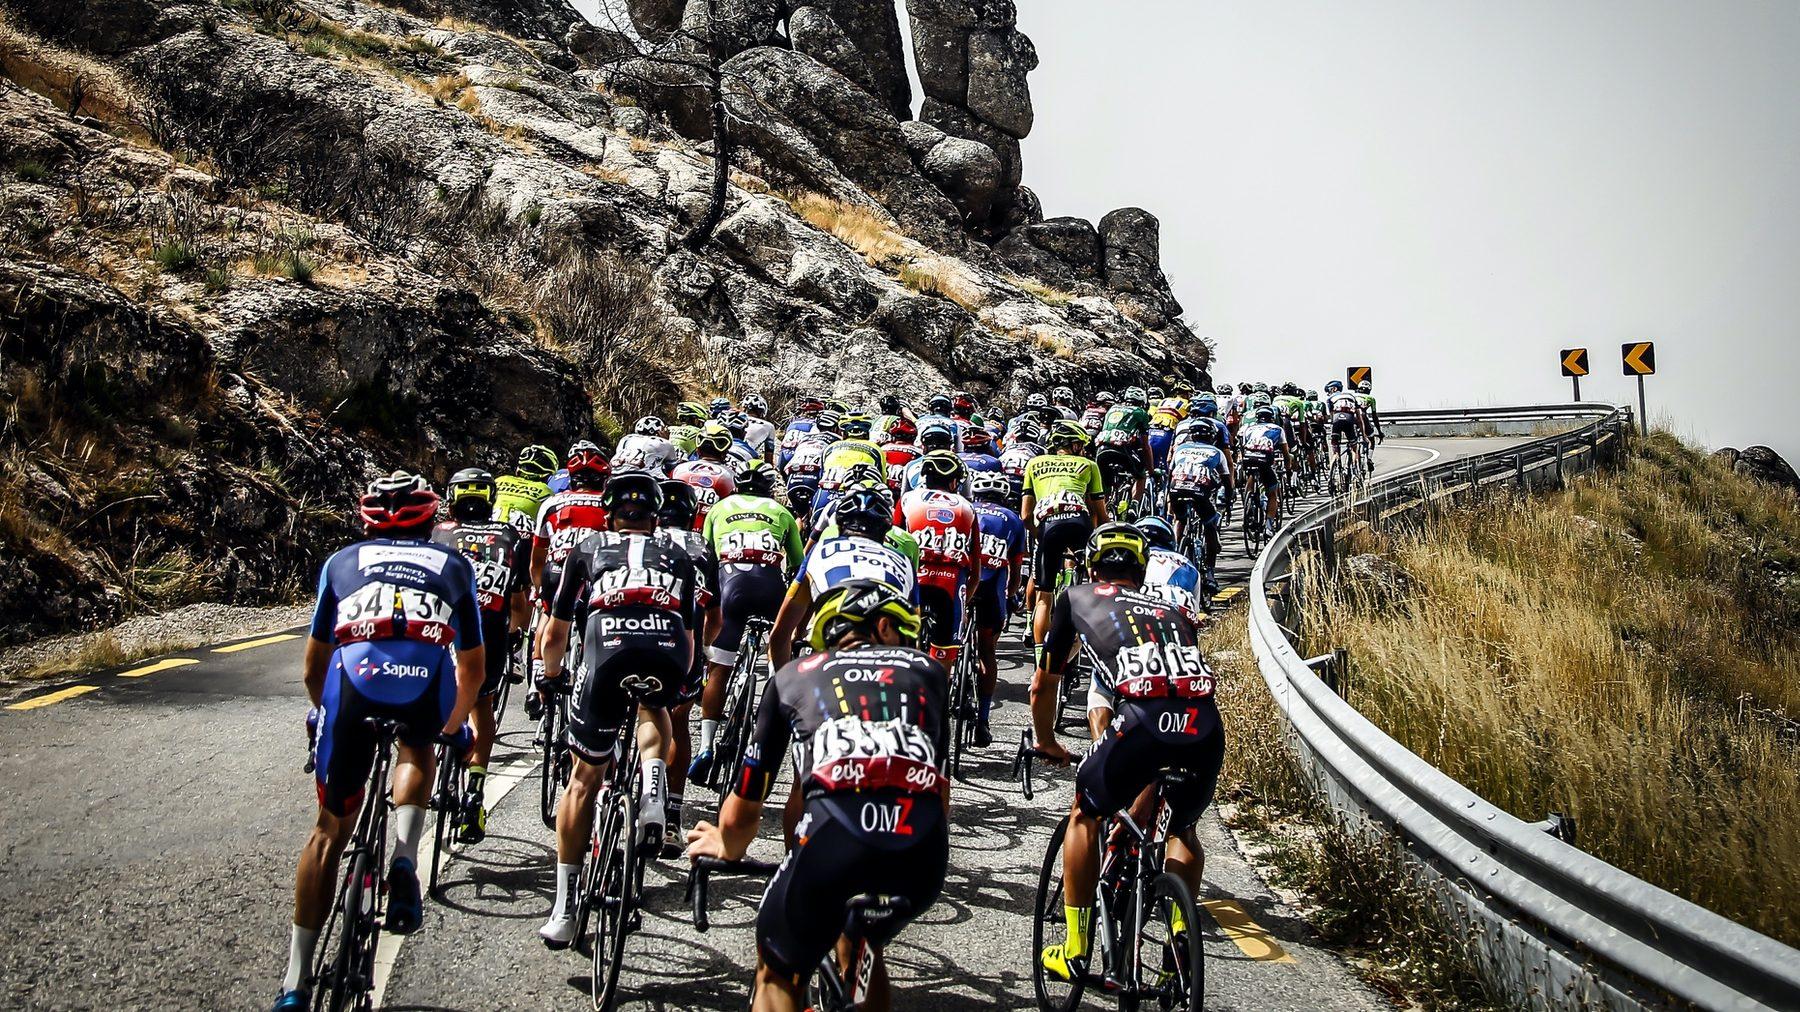 Volta a Portugal 2019 – As Etapas e a Start List das equipas